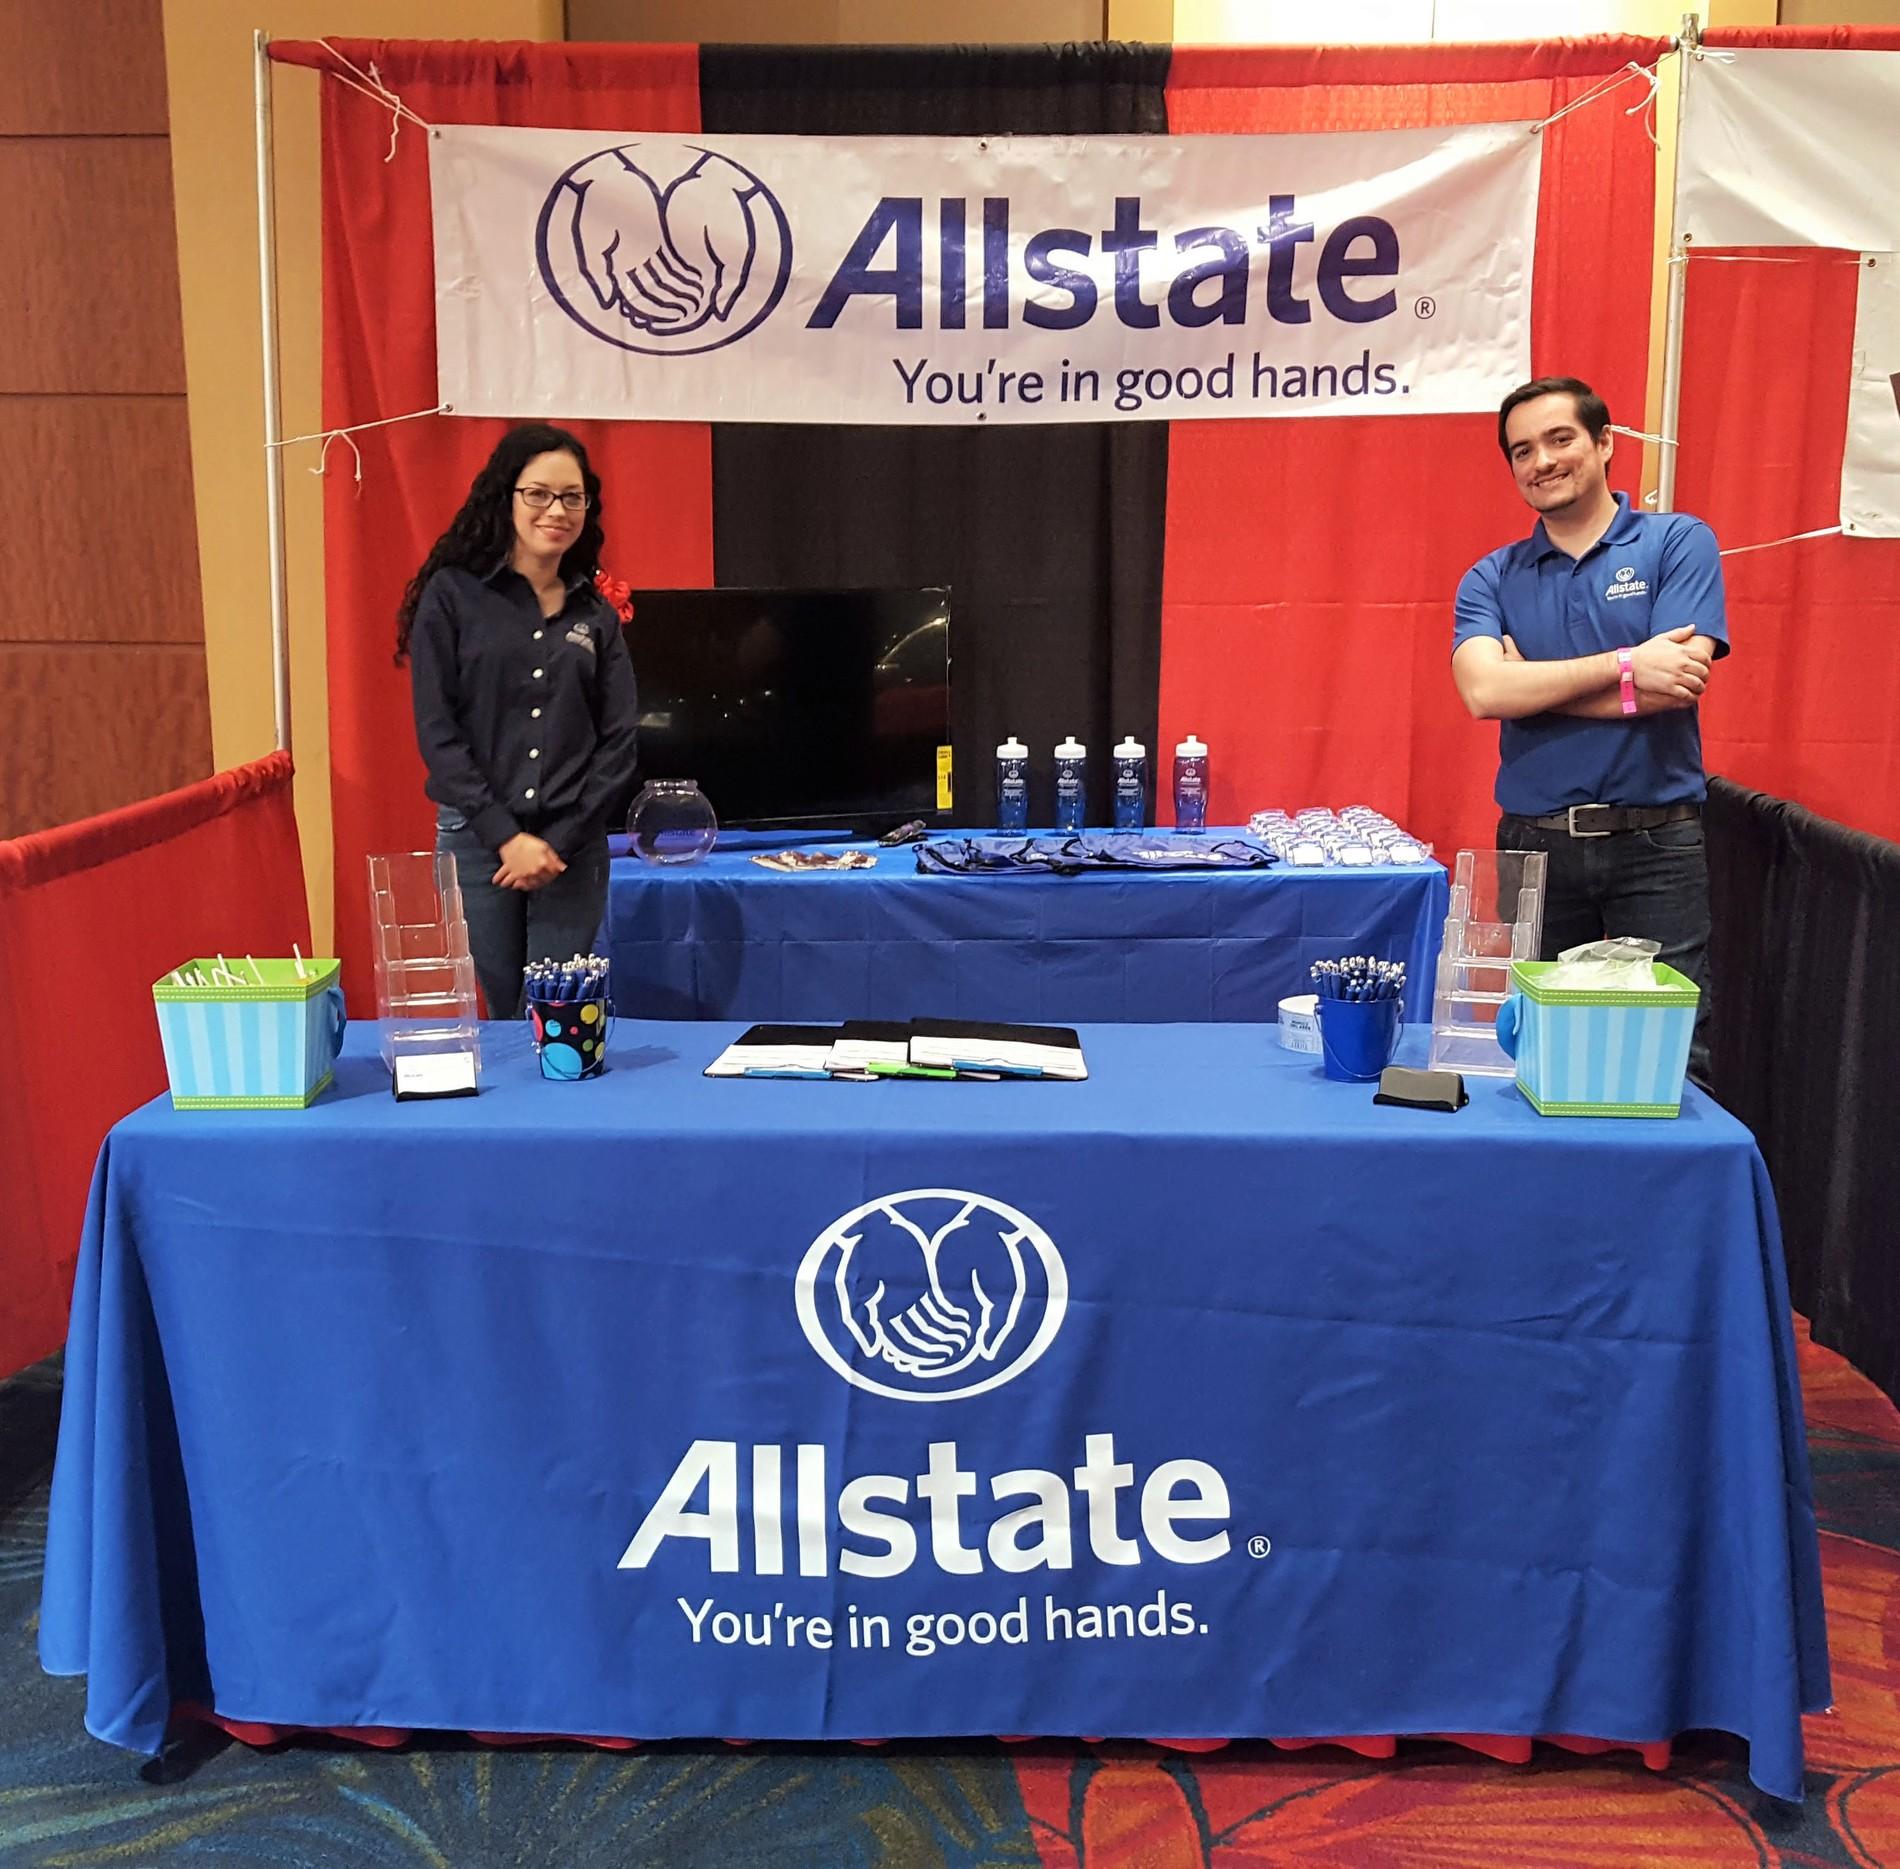 Allstate | Car Insurance in McAllen, TX - Abelardo Ramirez-Meda